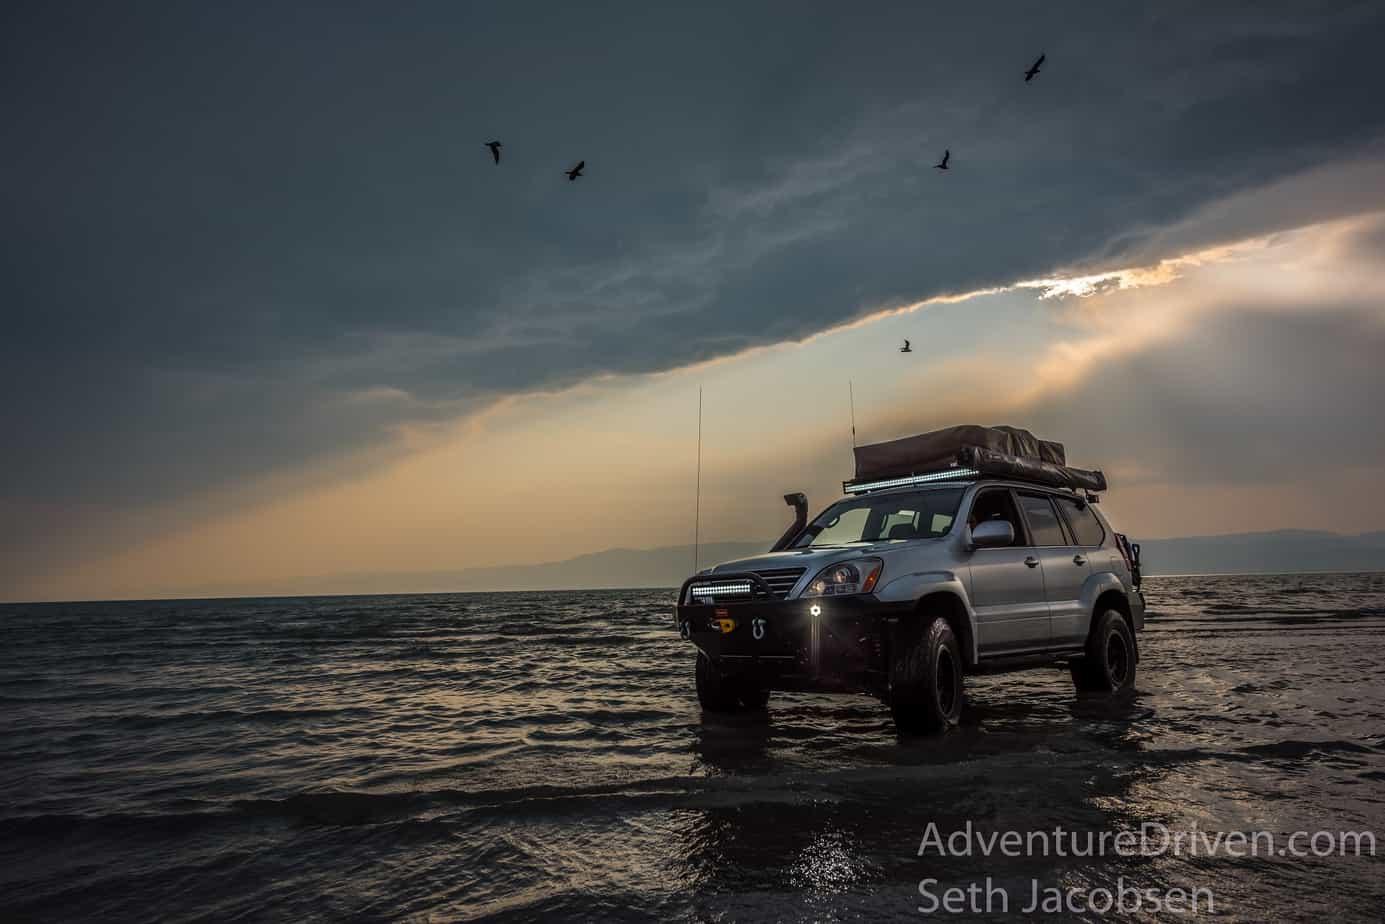 Lexus GX470 Adventure Driven sunset on water-1-2